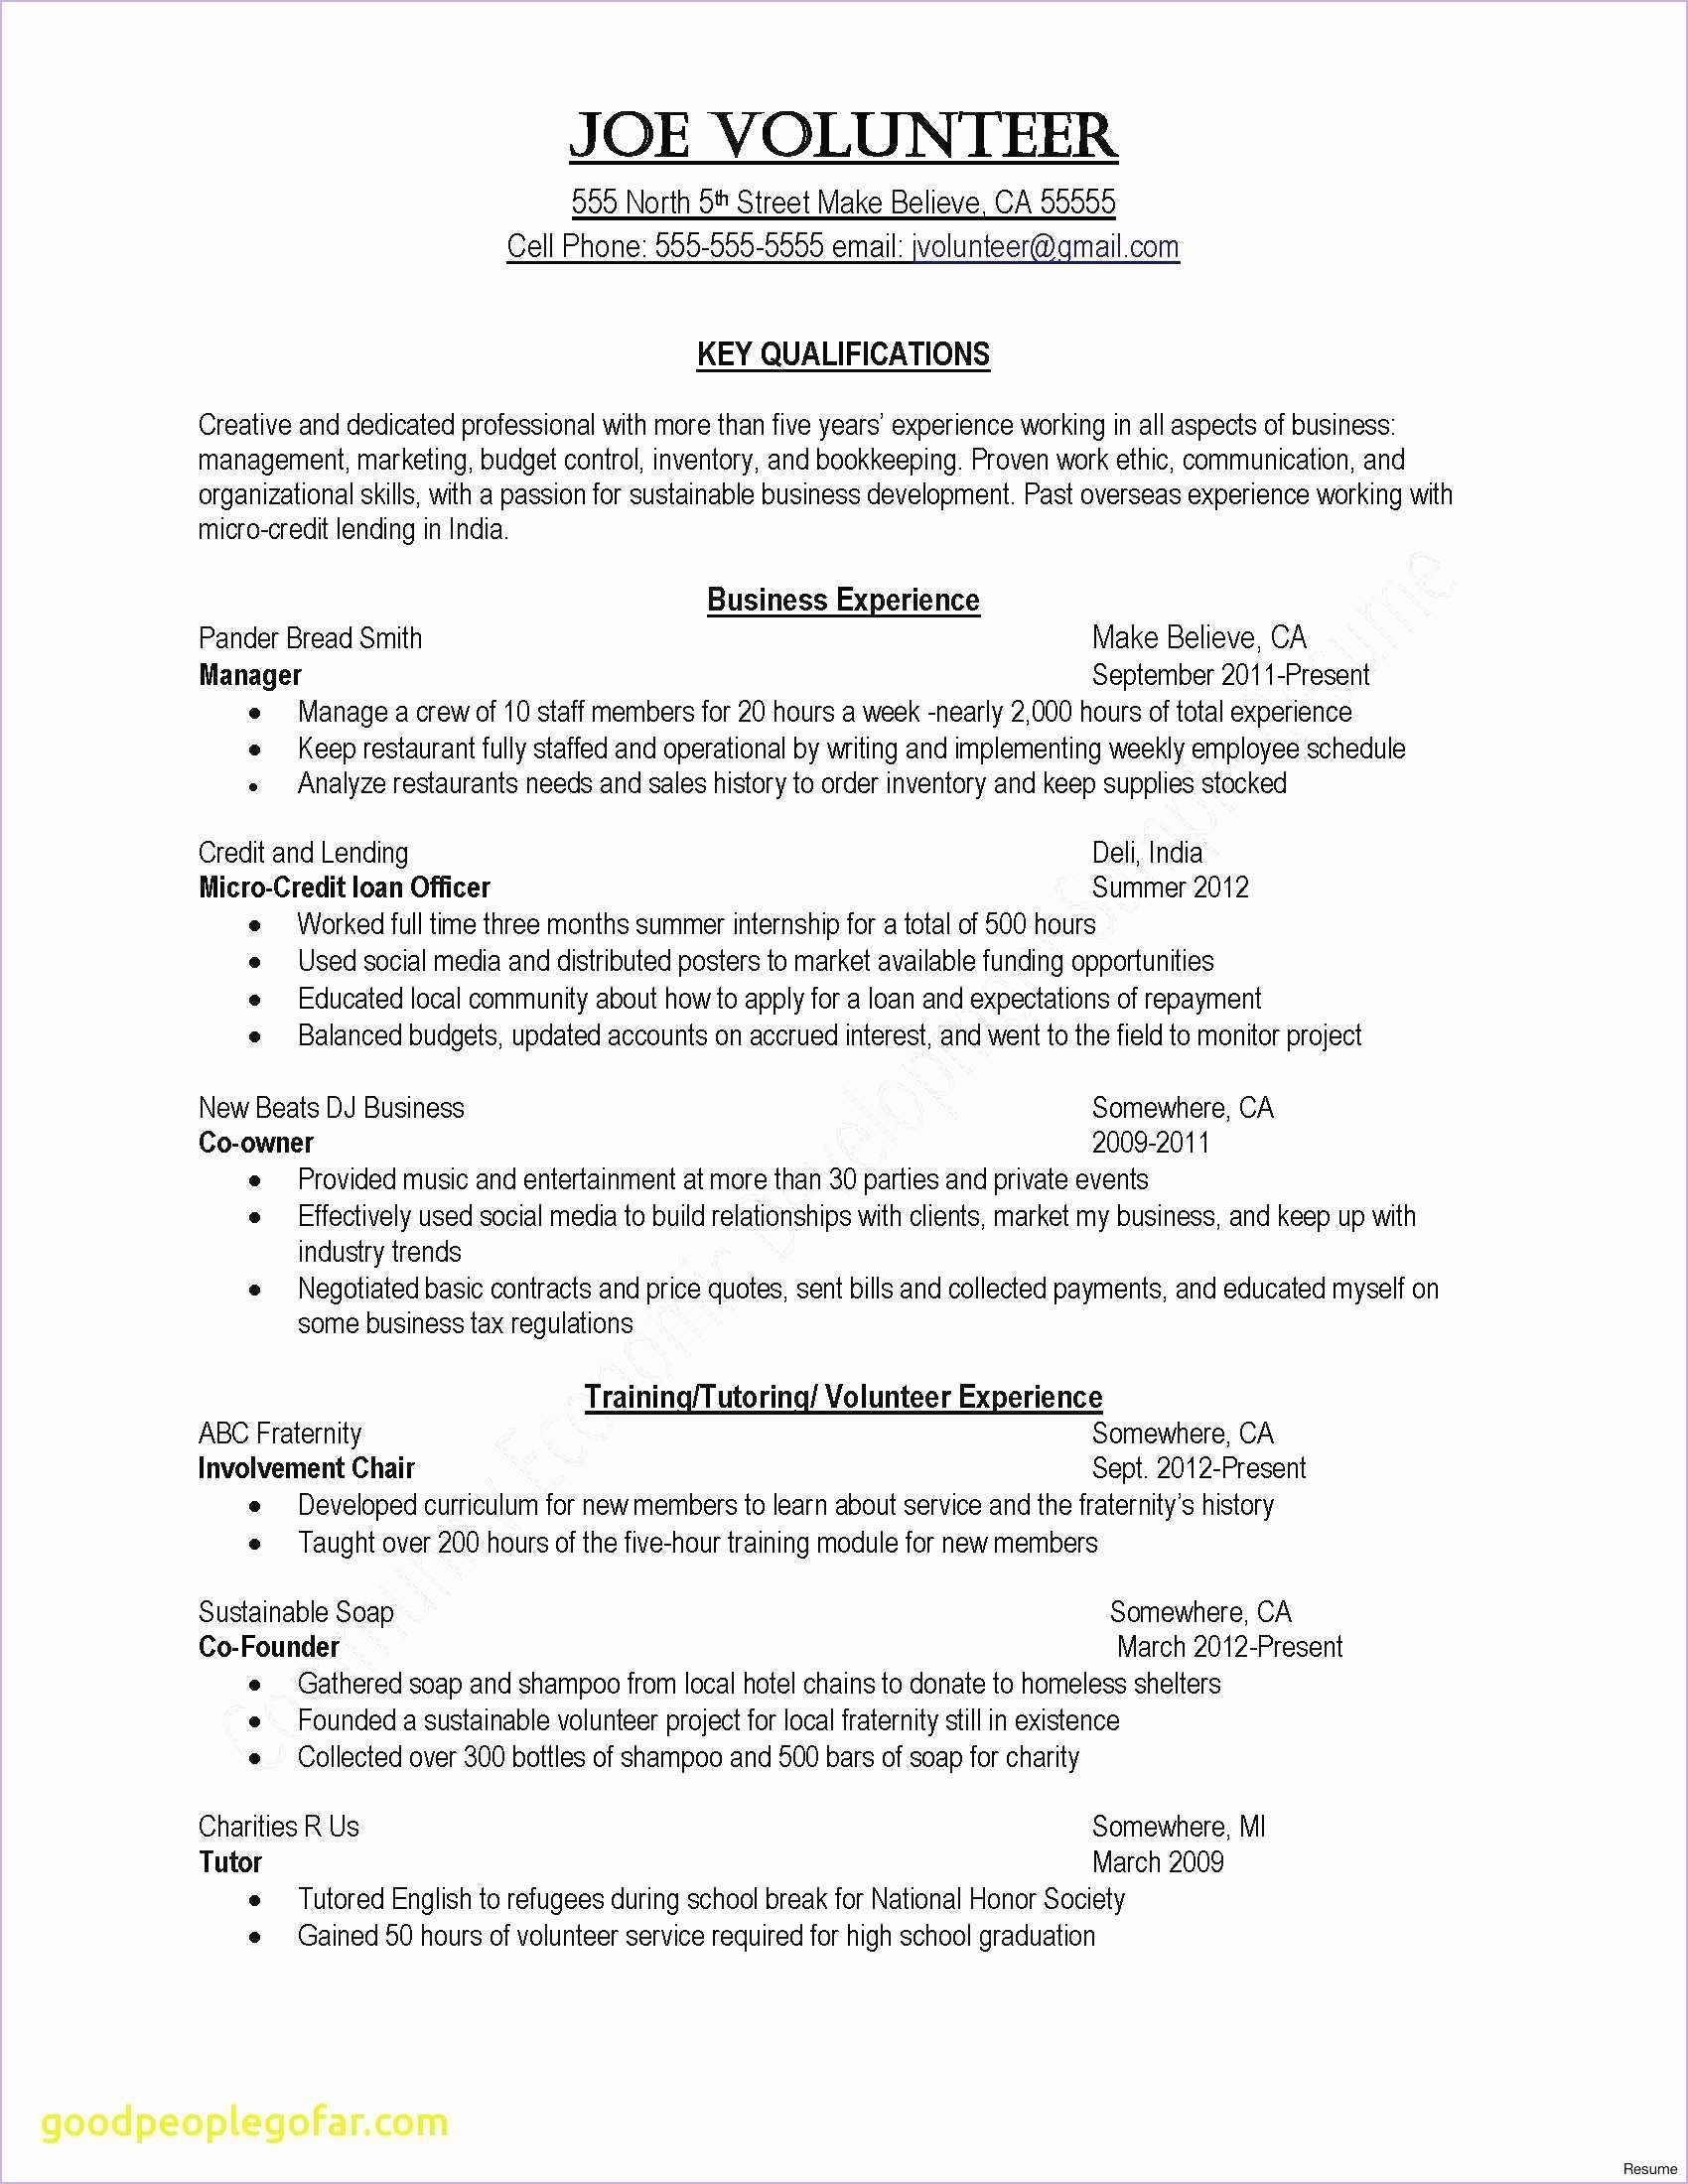 Resume For Graduate School Graduate School Cv Template 29 Grad School Resume Format Model Of Graduate School Cv Template resume for graduate school|wikiresume.com